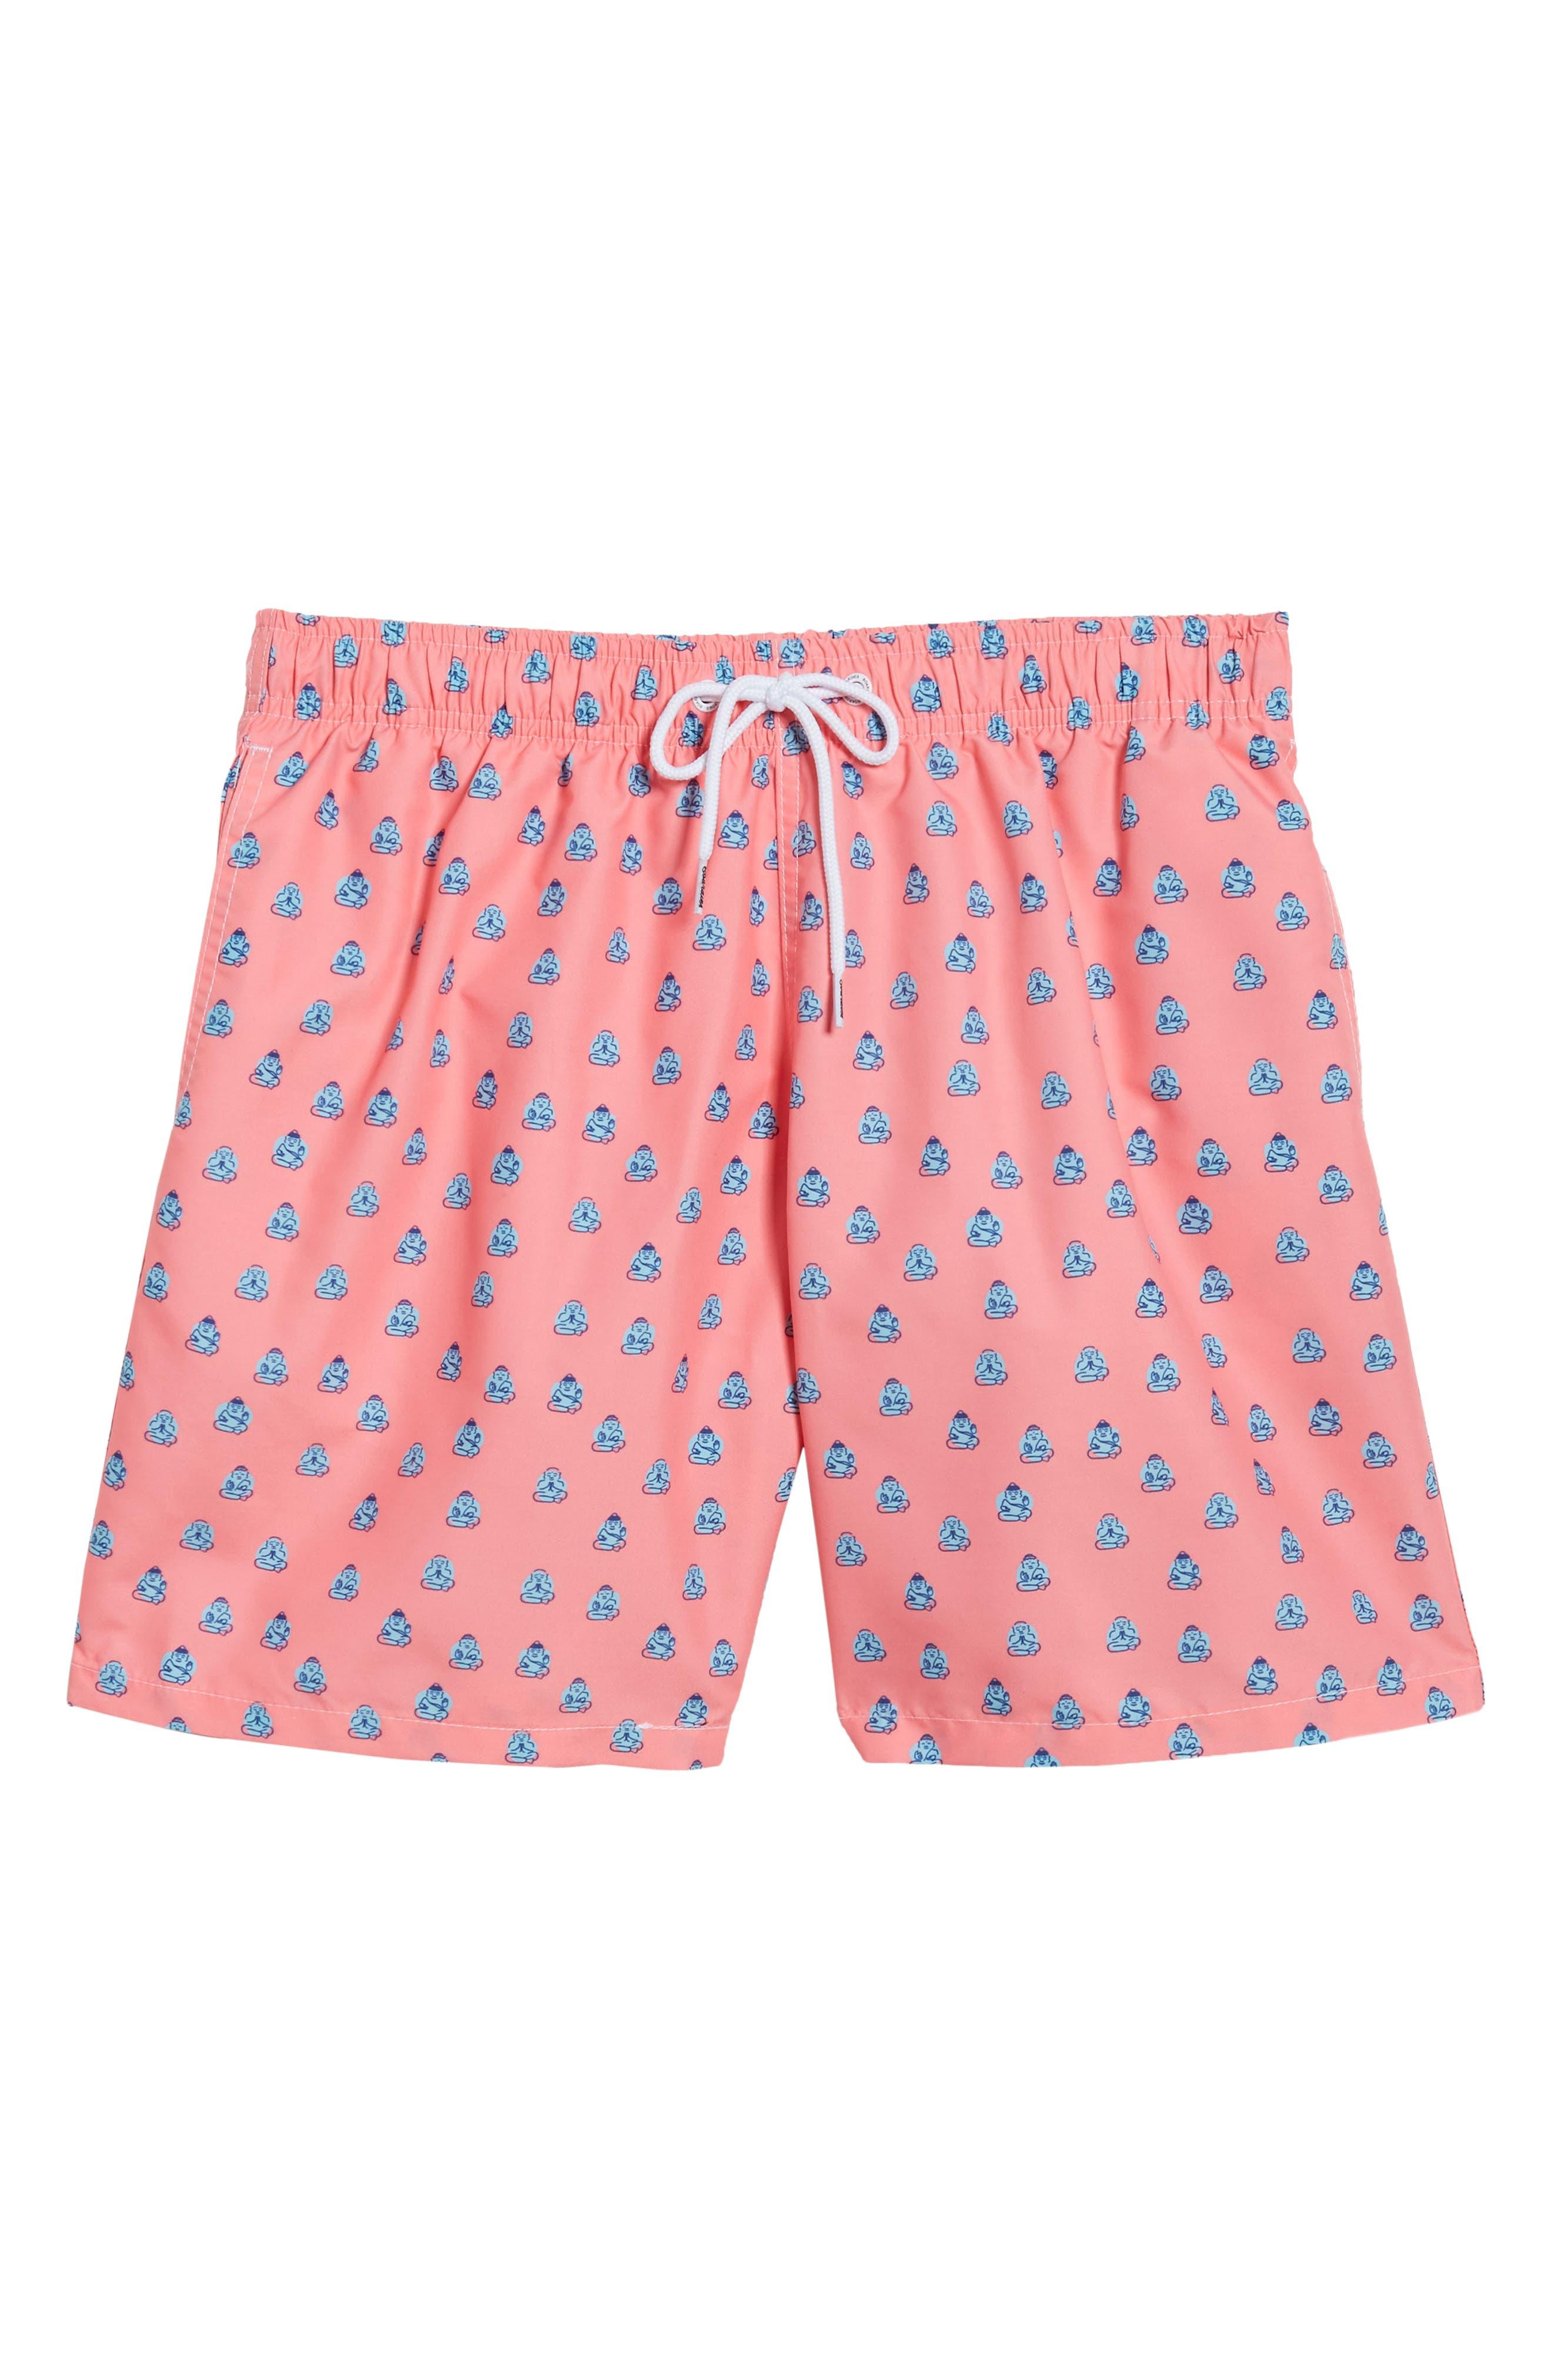 Polka Zen Swim Shorts,                             Alternate thumbnail 6, color,                             Pink